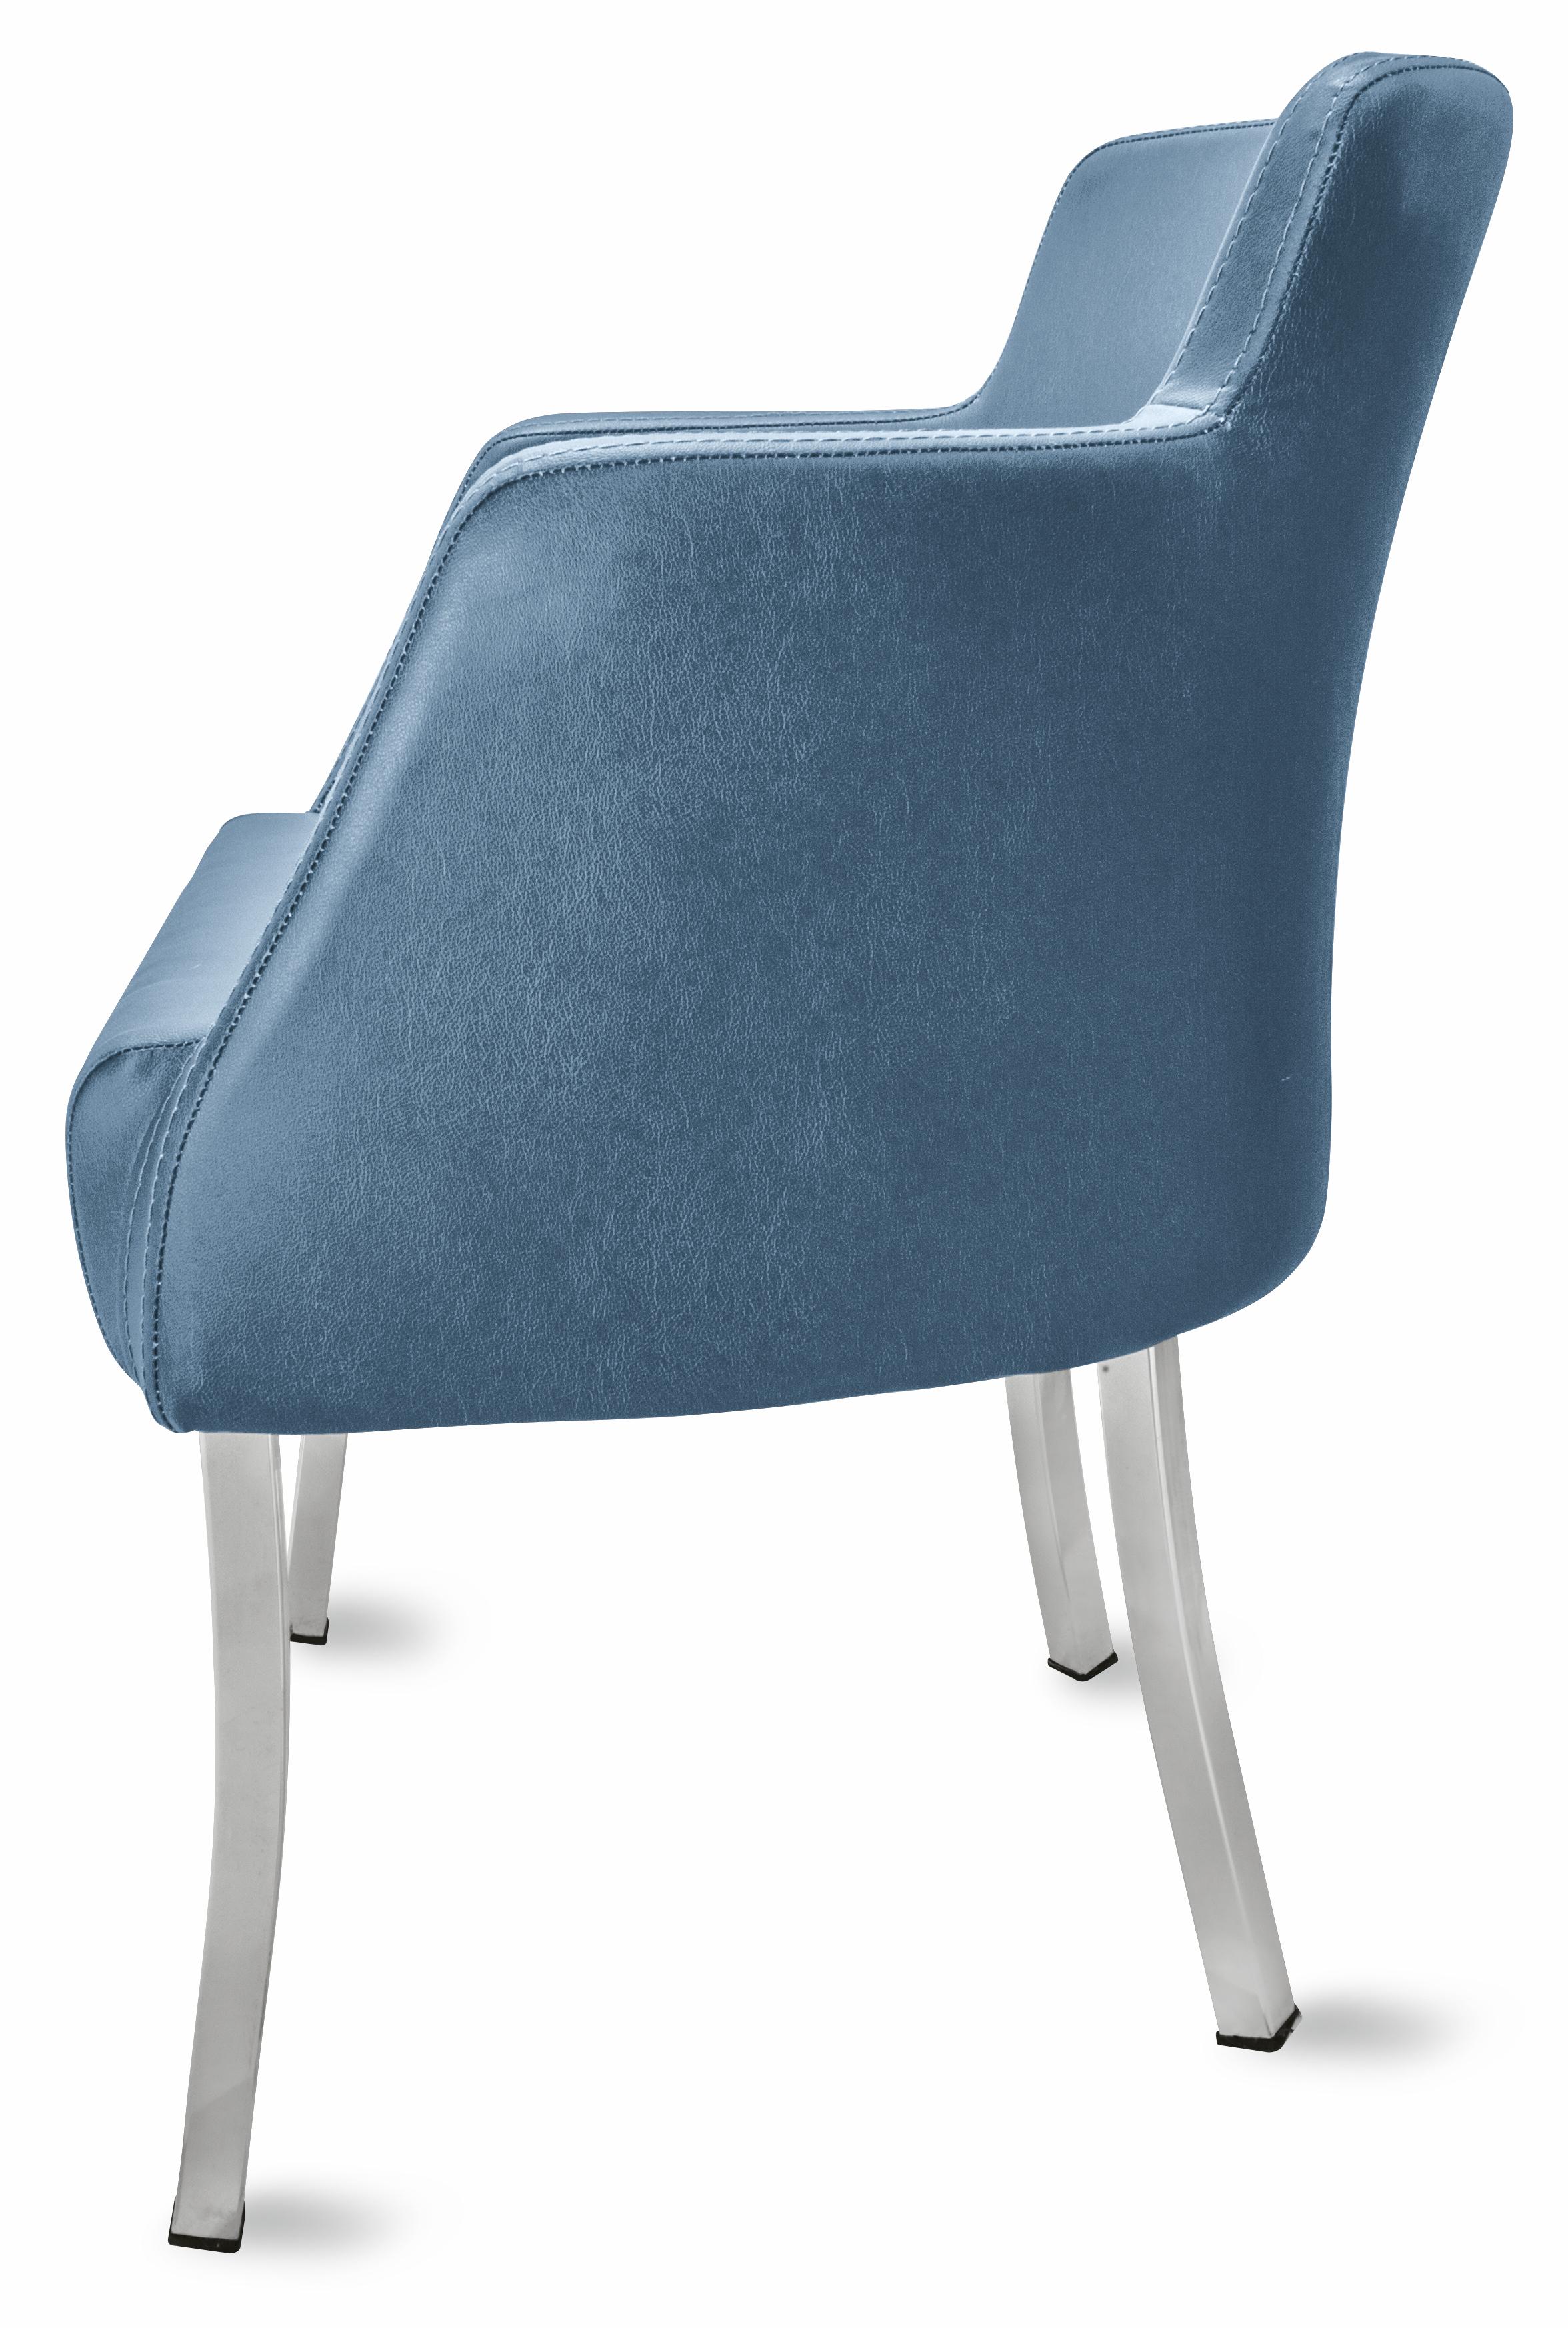 Gastro Stuhl Sessel Primo Eisblau Günstig Kaufen Möbel Star